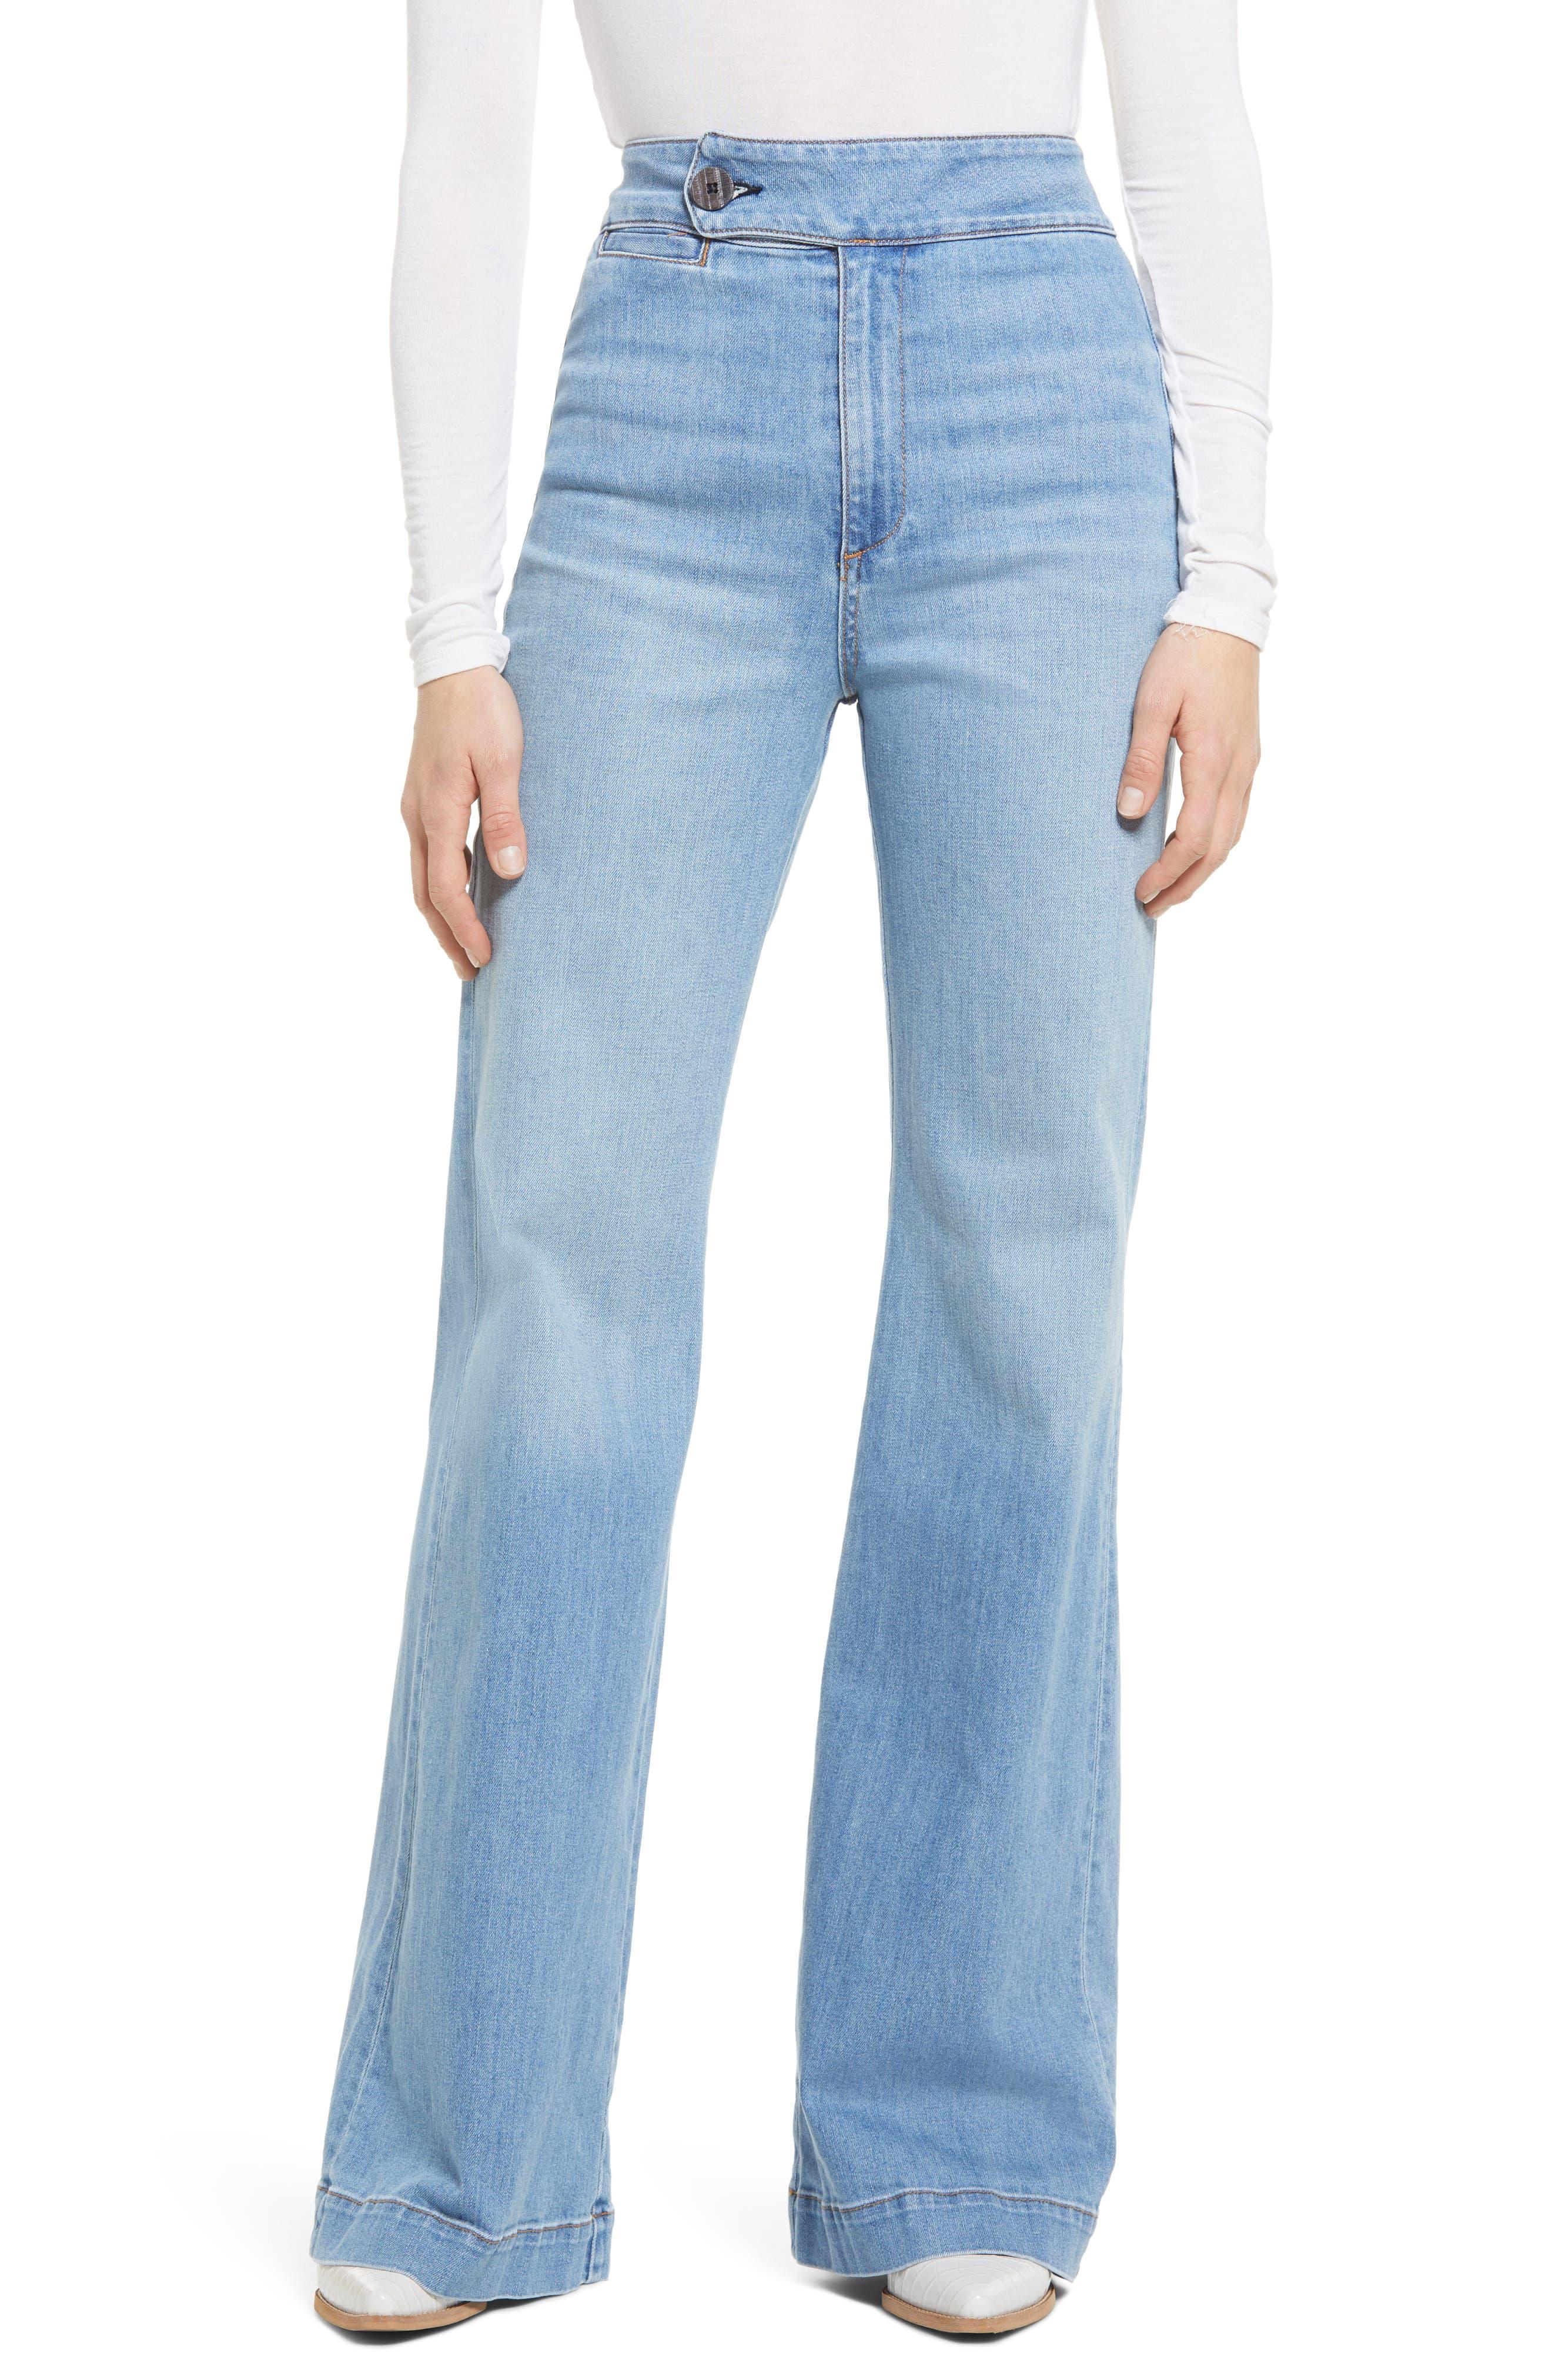 60s Pants, Jeans, Hippie, Flares, Jumpsuits Womens Askk Ny 70S High Waist Wide Leg Jeans Size 29 - Blue $225.00 AT vintagedancer.com